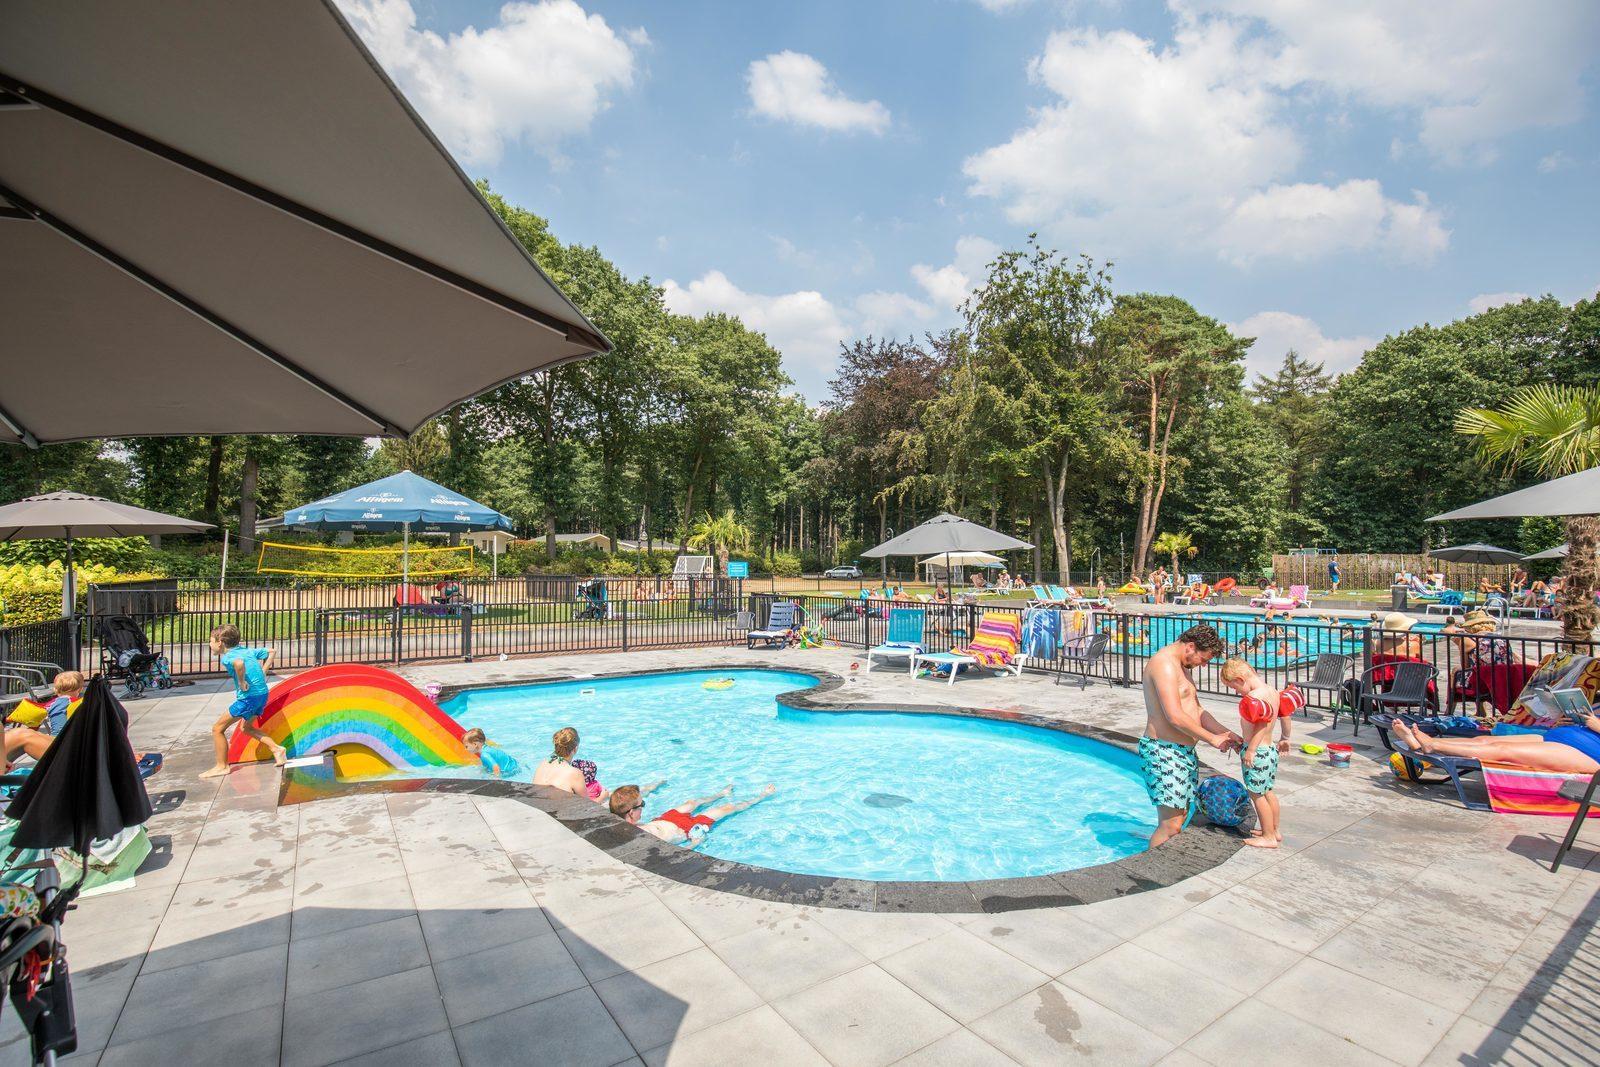 Zwembad Landgoed de Scheleberg